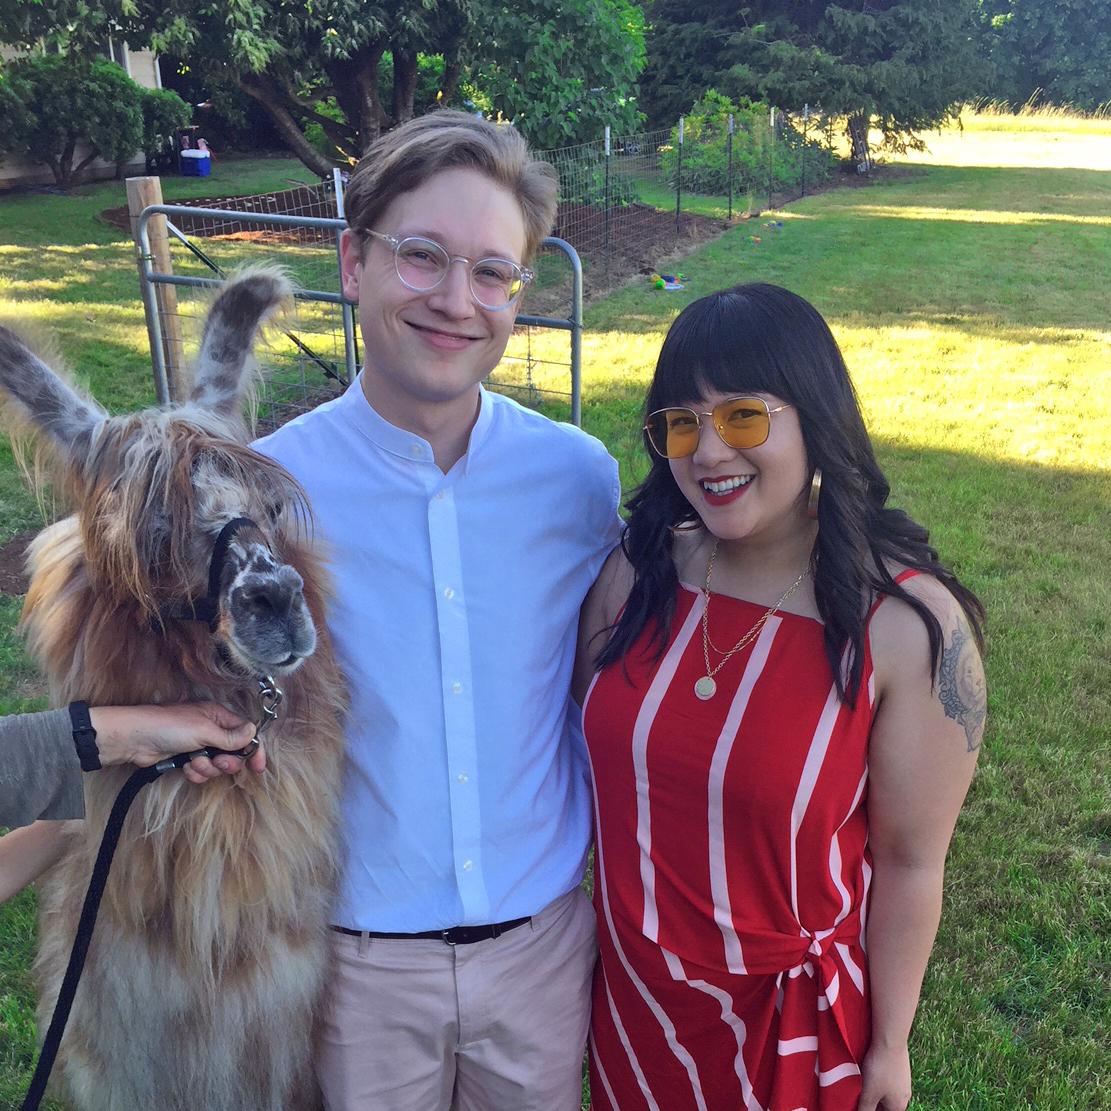 Jessica with her Boyfriend and a Llama